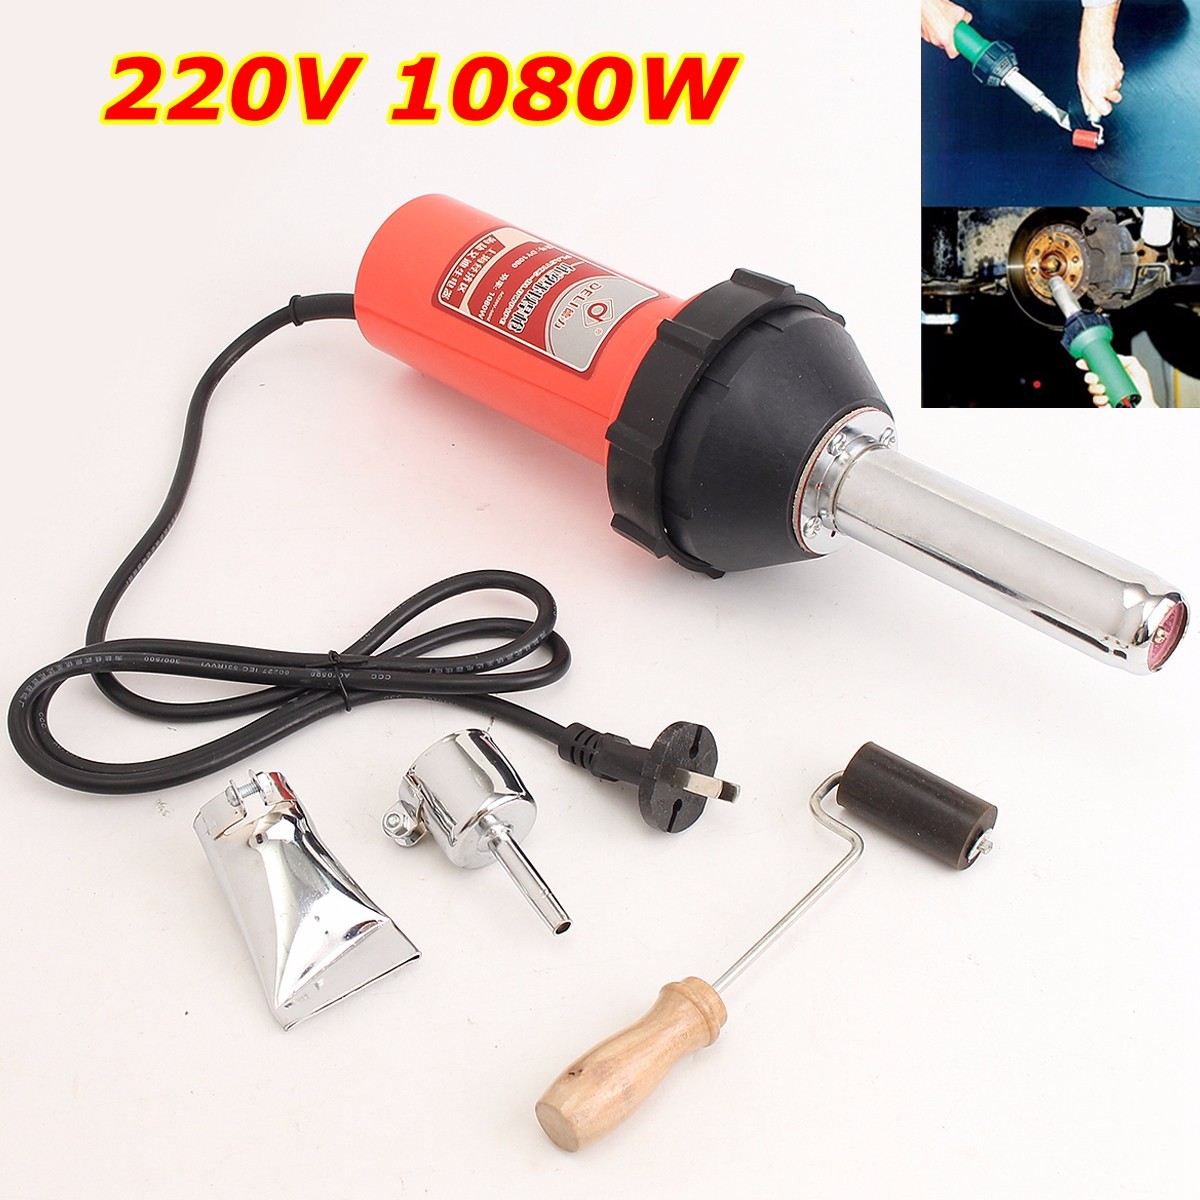 220V 1080W 50Hz Plastic Welding Hot Air Torch Welding Gun Pistol Tool w/ Nozzle and Pressure Roller Kit for Welding Machine